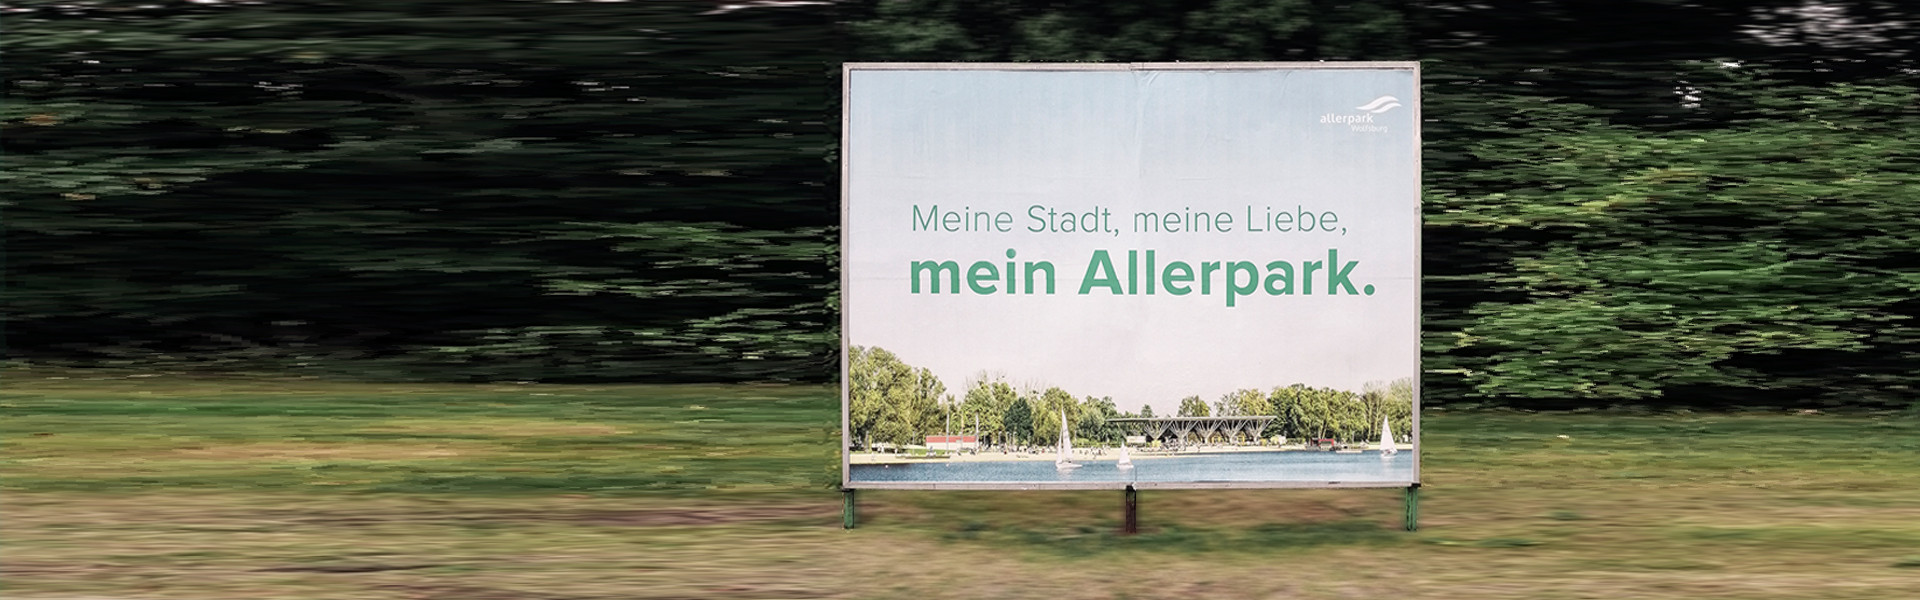 Plakaterbung-Achtzehneintel-Allerpark Wo